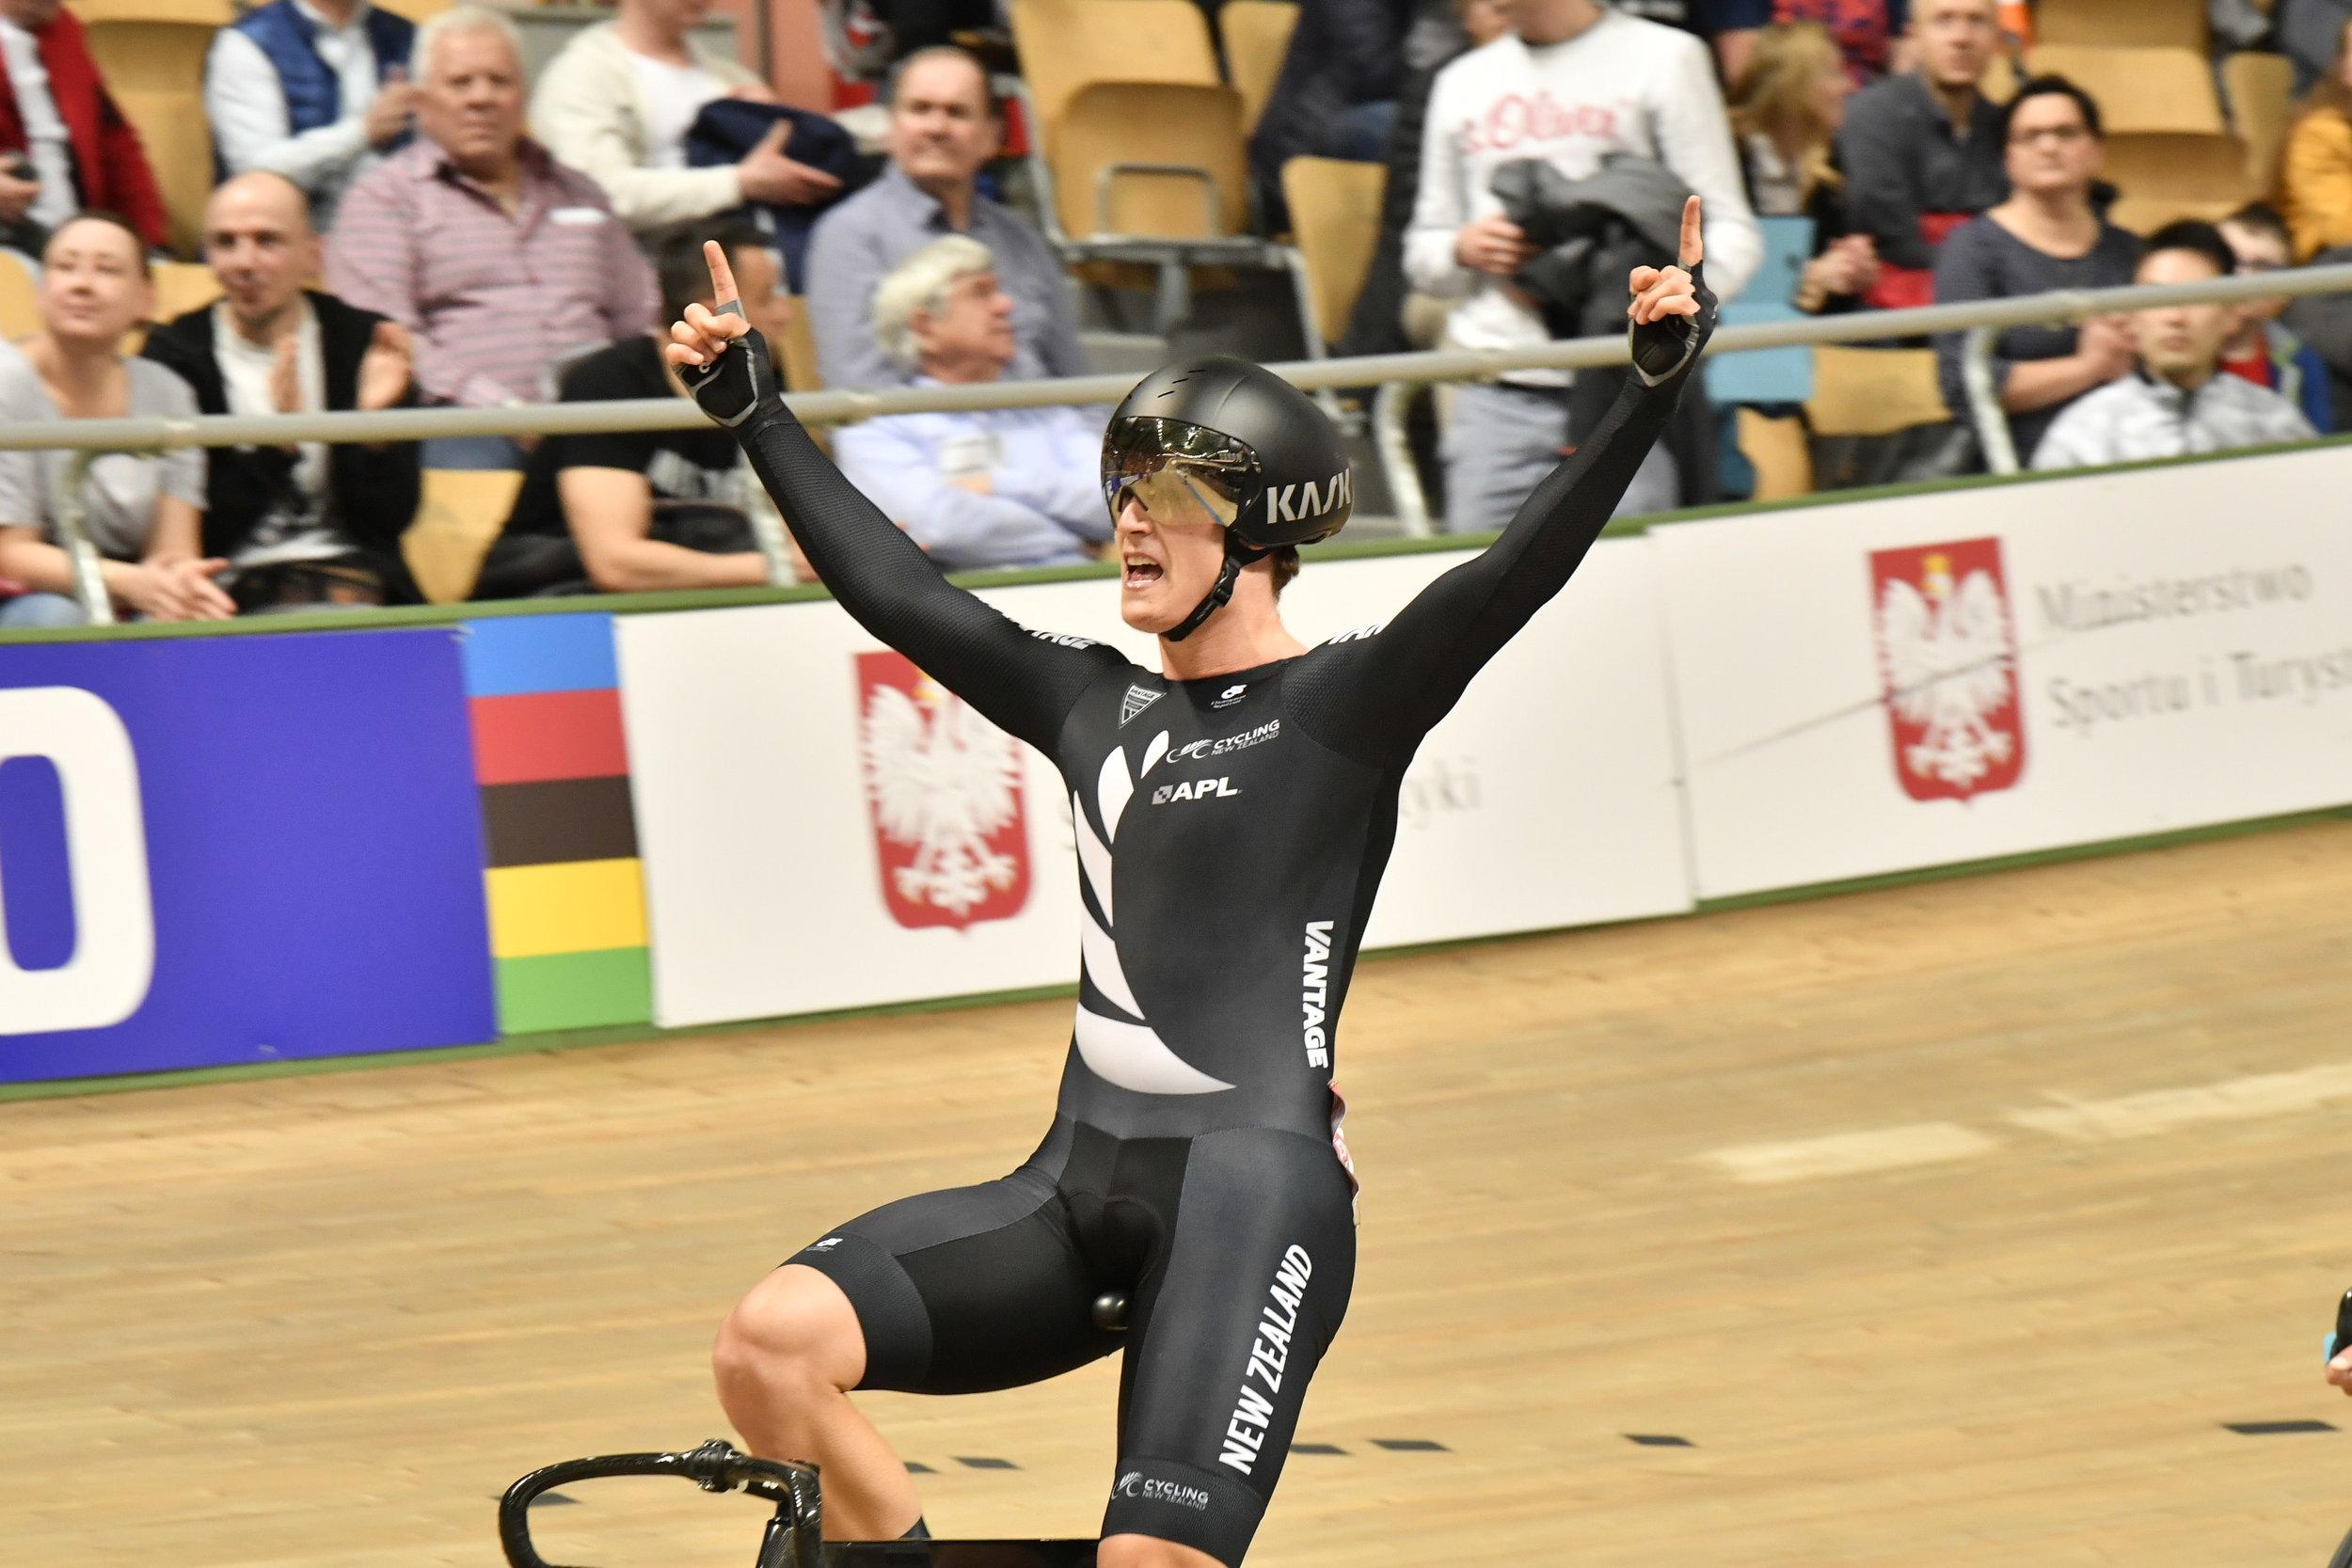 Photo: Campbell Stewart celebrates winning the world omnium title in Poland. Pic: Guy Swarbrick